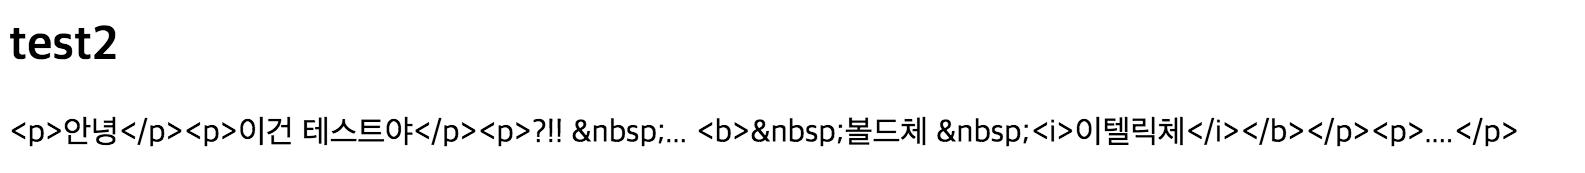 django template html code display in raw